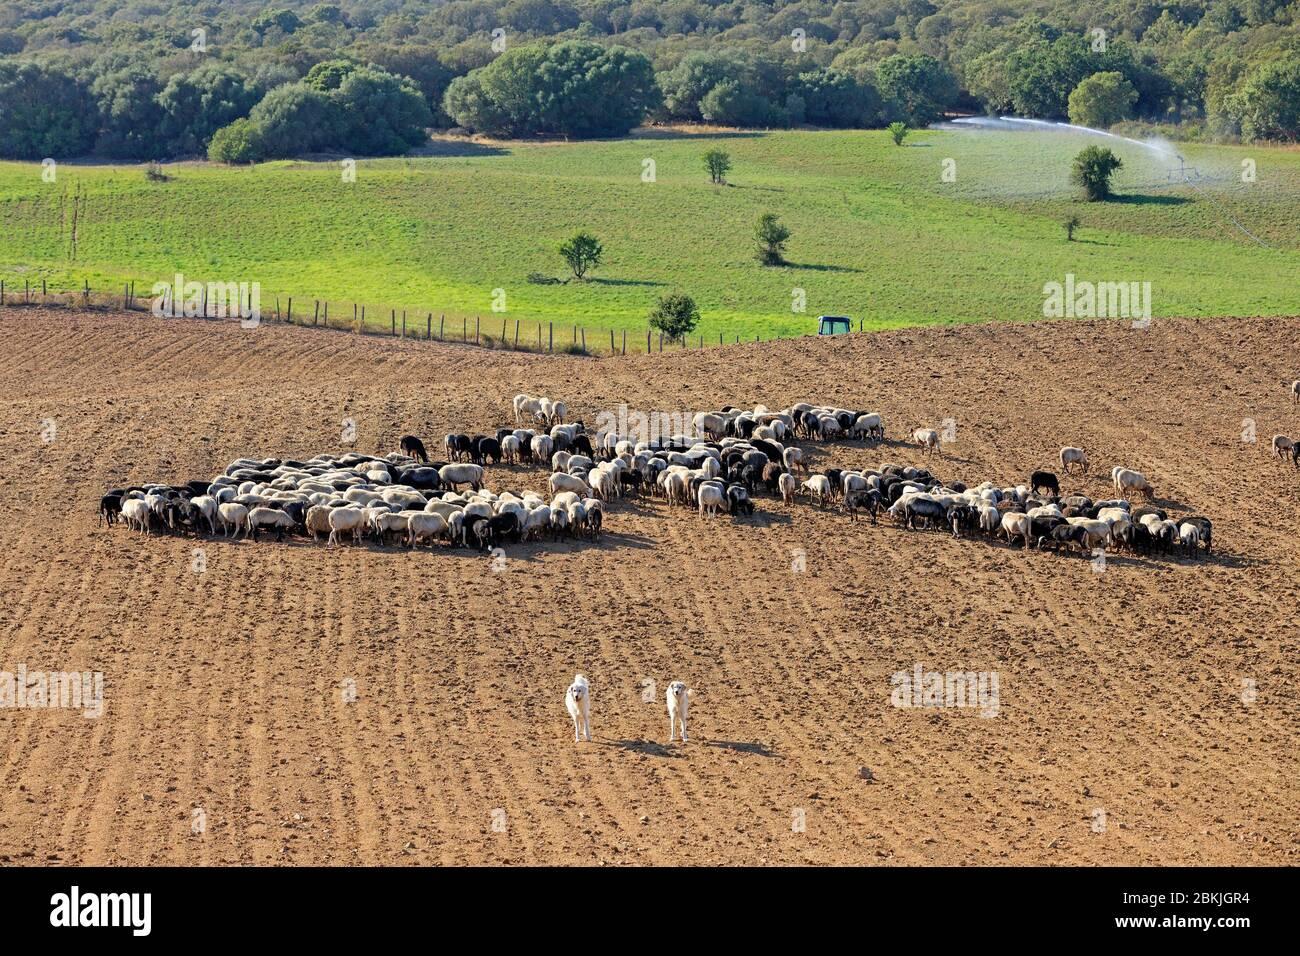 Francia, Corse du Sud, Domaine de Murtoli, meseta de Cauria, ovejas (mención obligatoria Domaine de Murtoli) Foto de stock